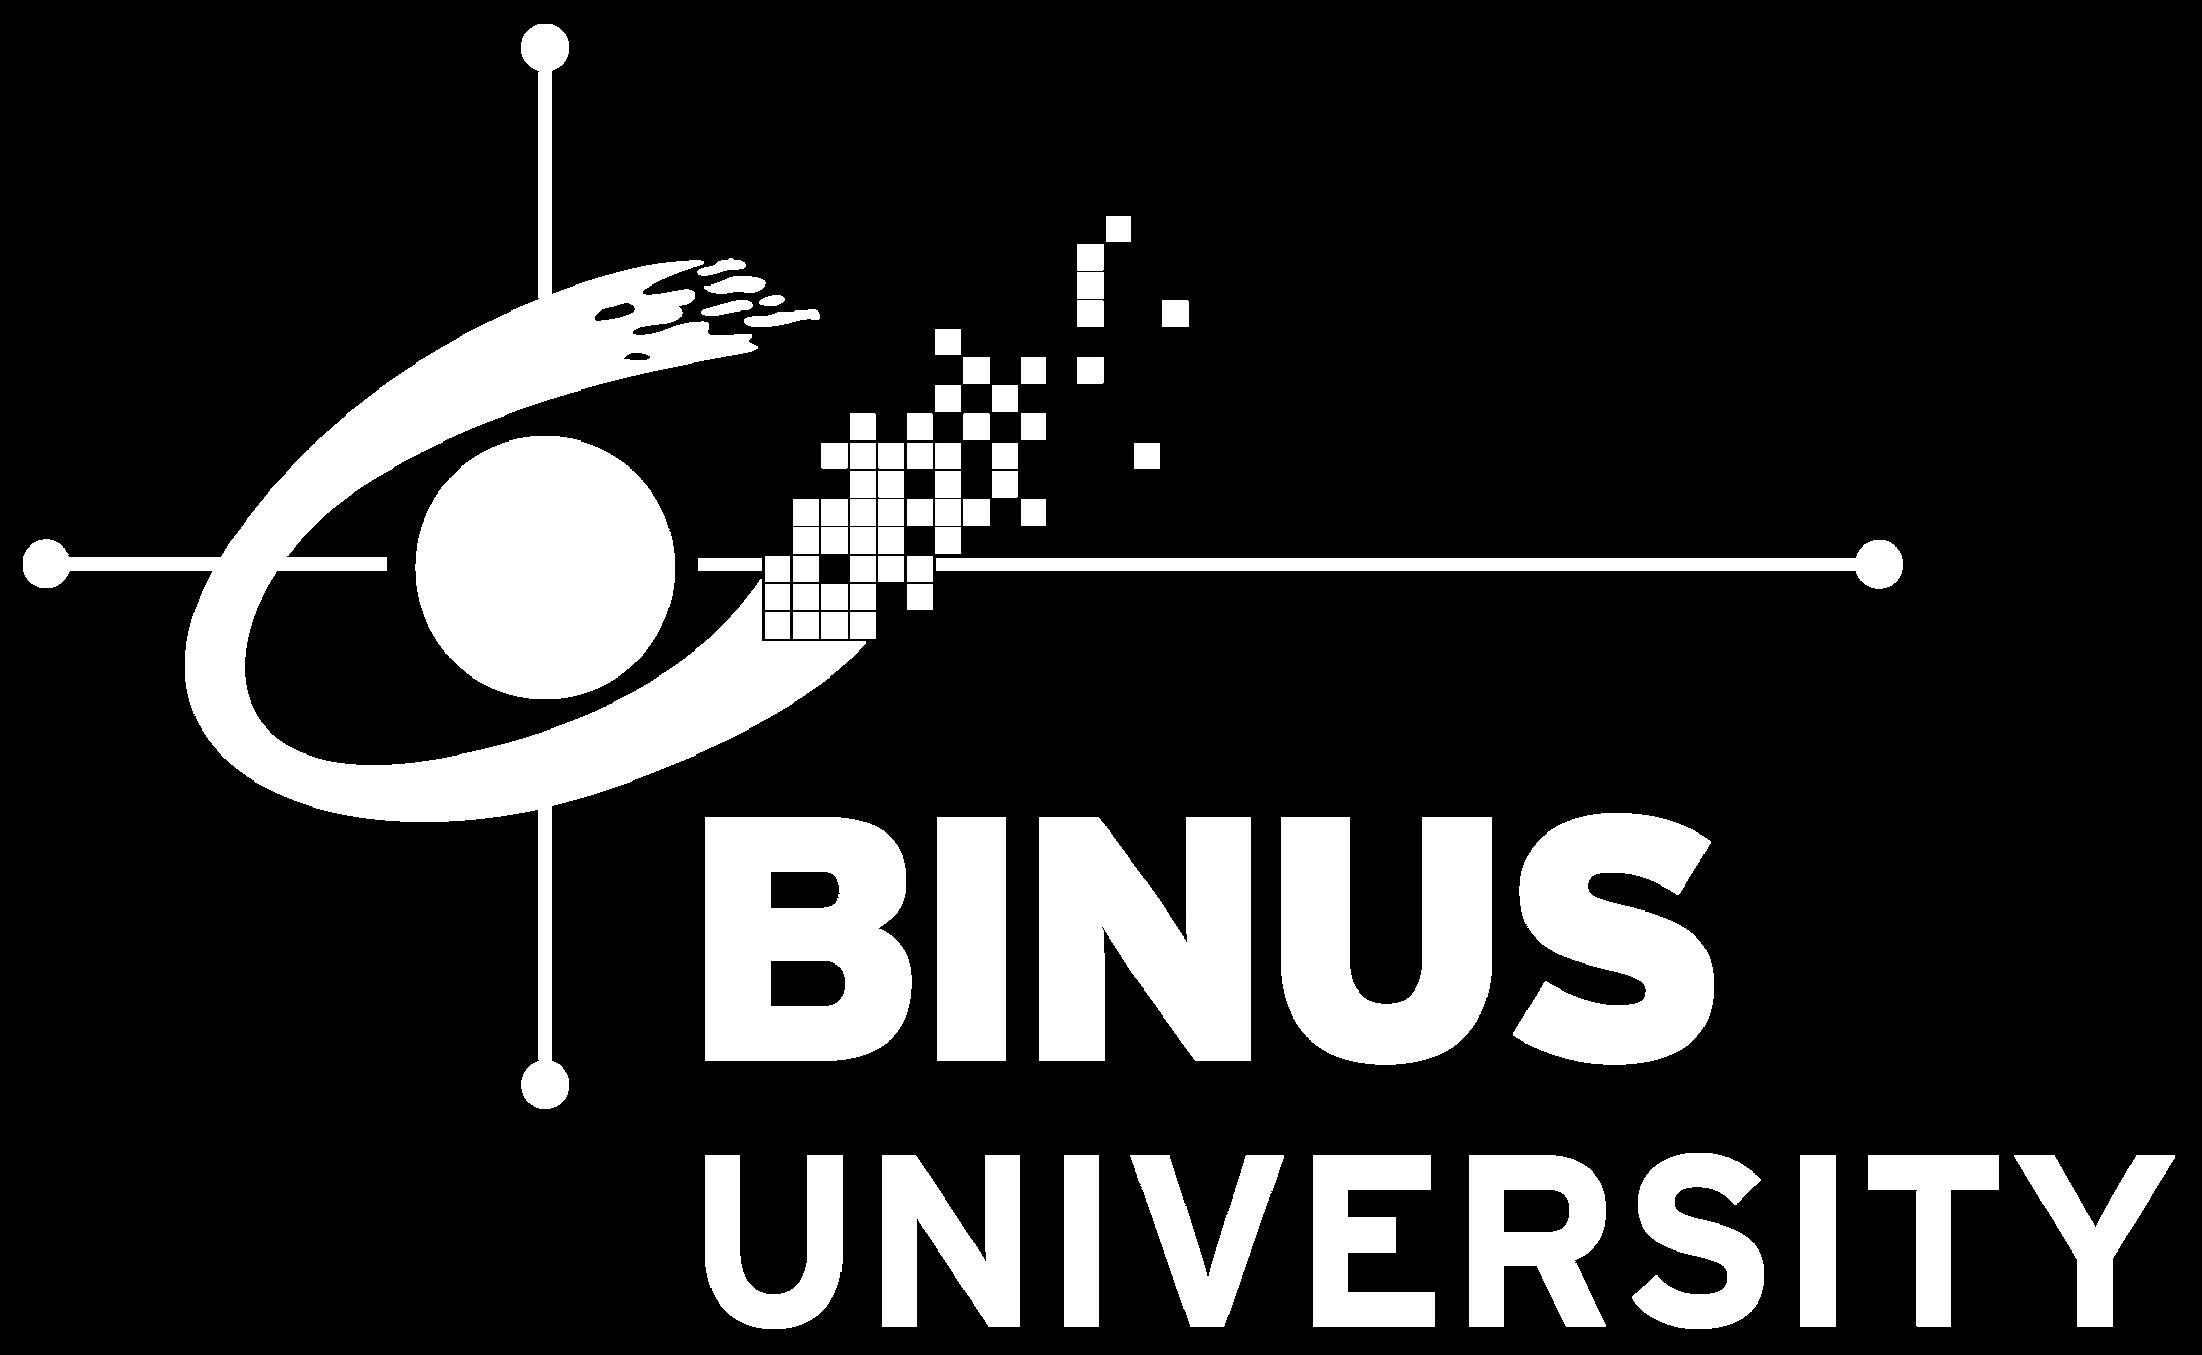 Logo-Binus-University-Universitas-Bina-Nusantara-Original-PNG